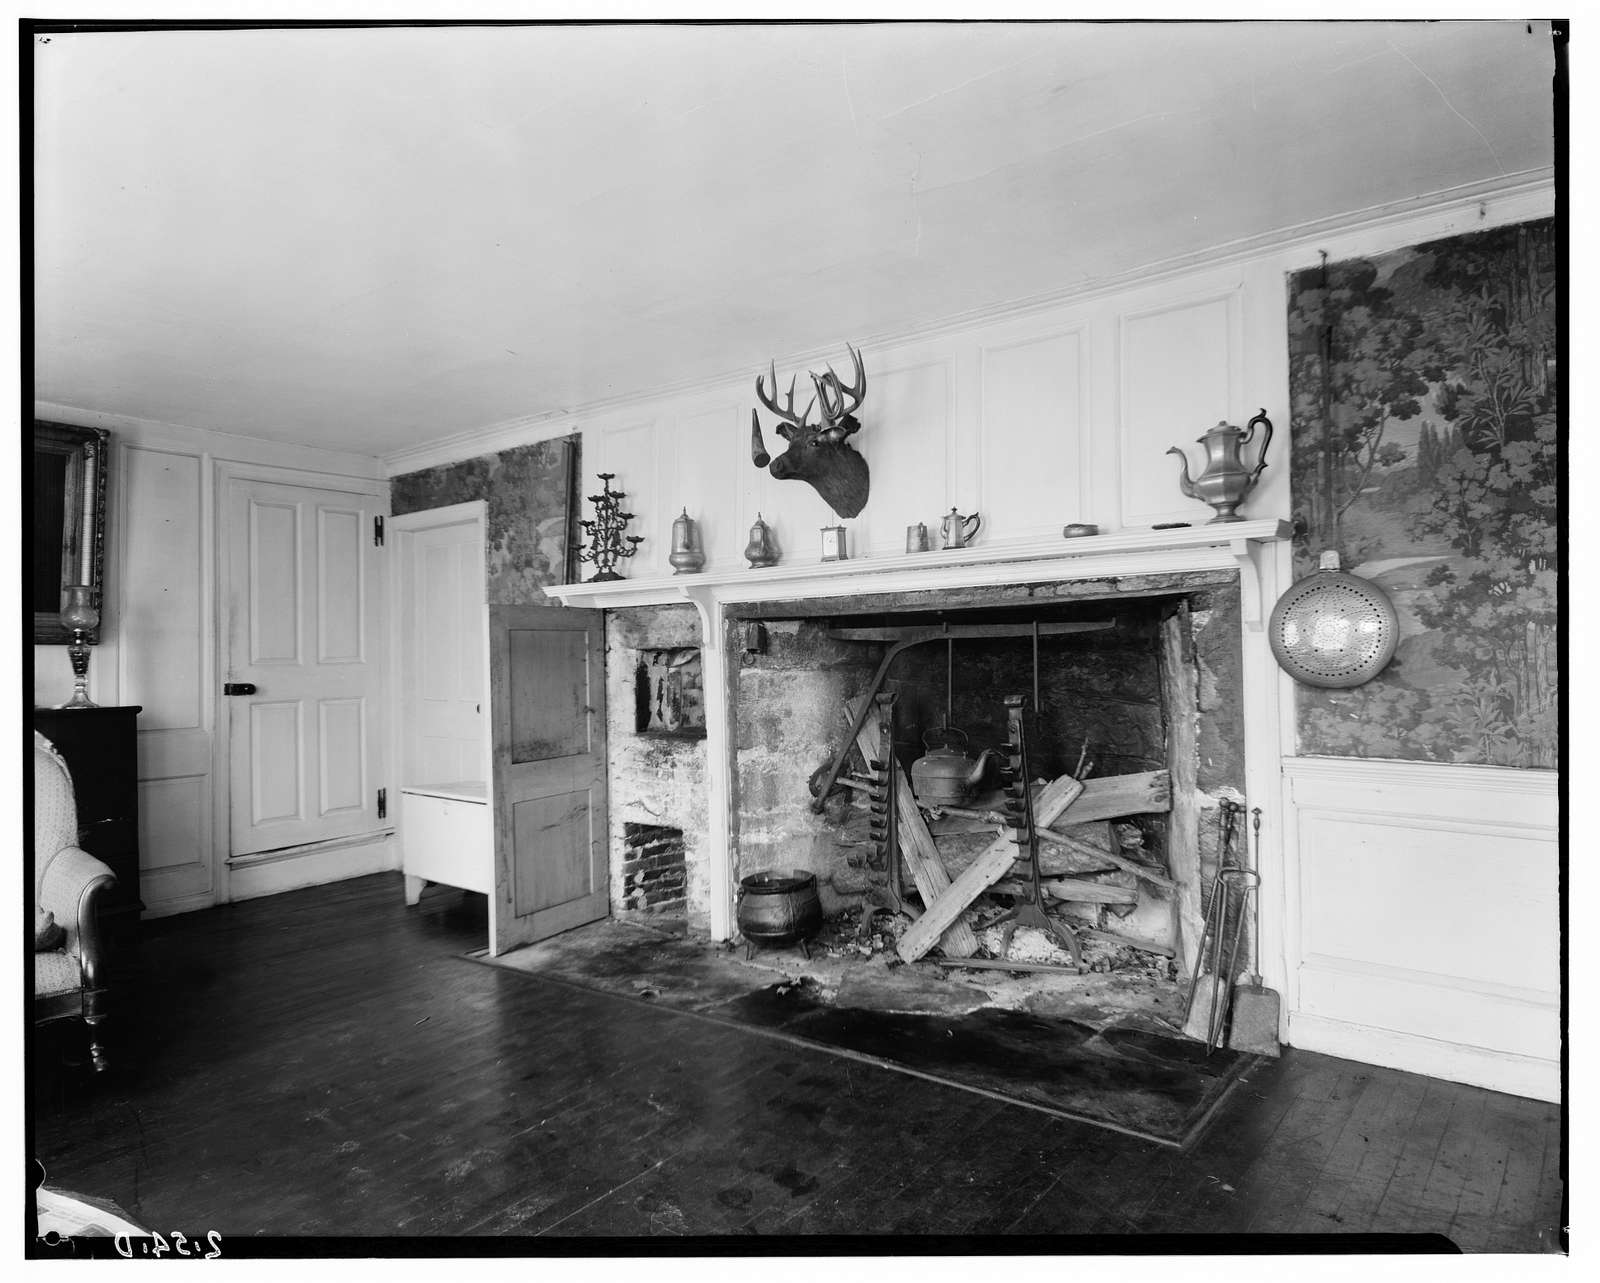 William Brattle Jr. House, 626 Williams Street, Pittsfield, Berkshire County, MA